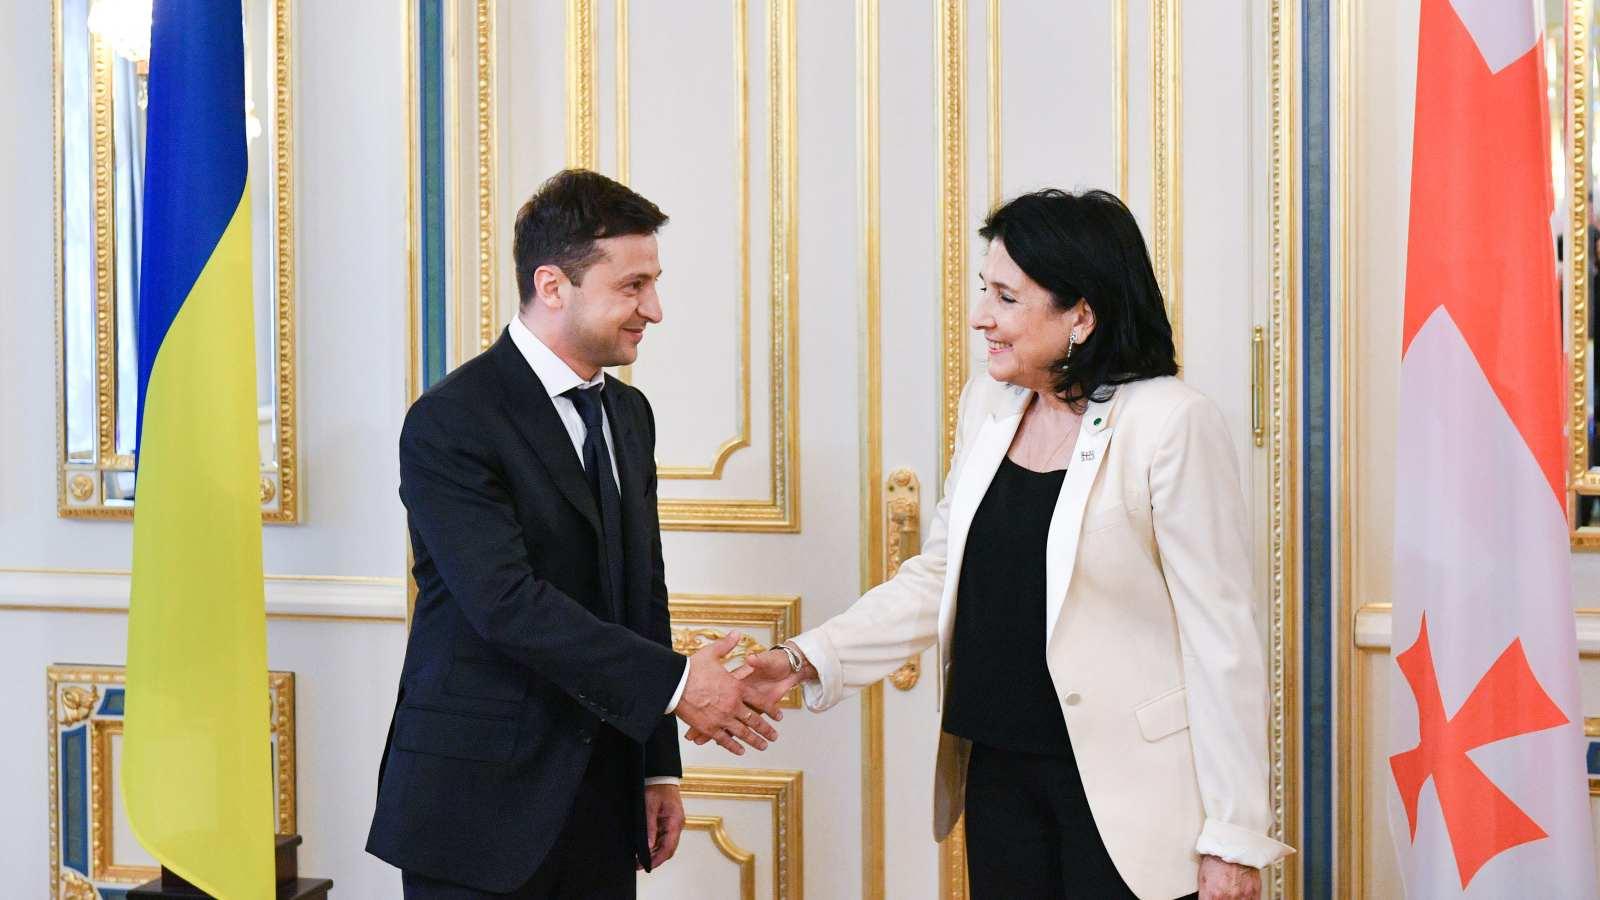 Photo: Volodymyr Zelensky with Salome Zourabichvili. Credit: Wikimedia Commons